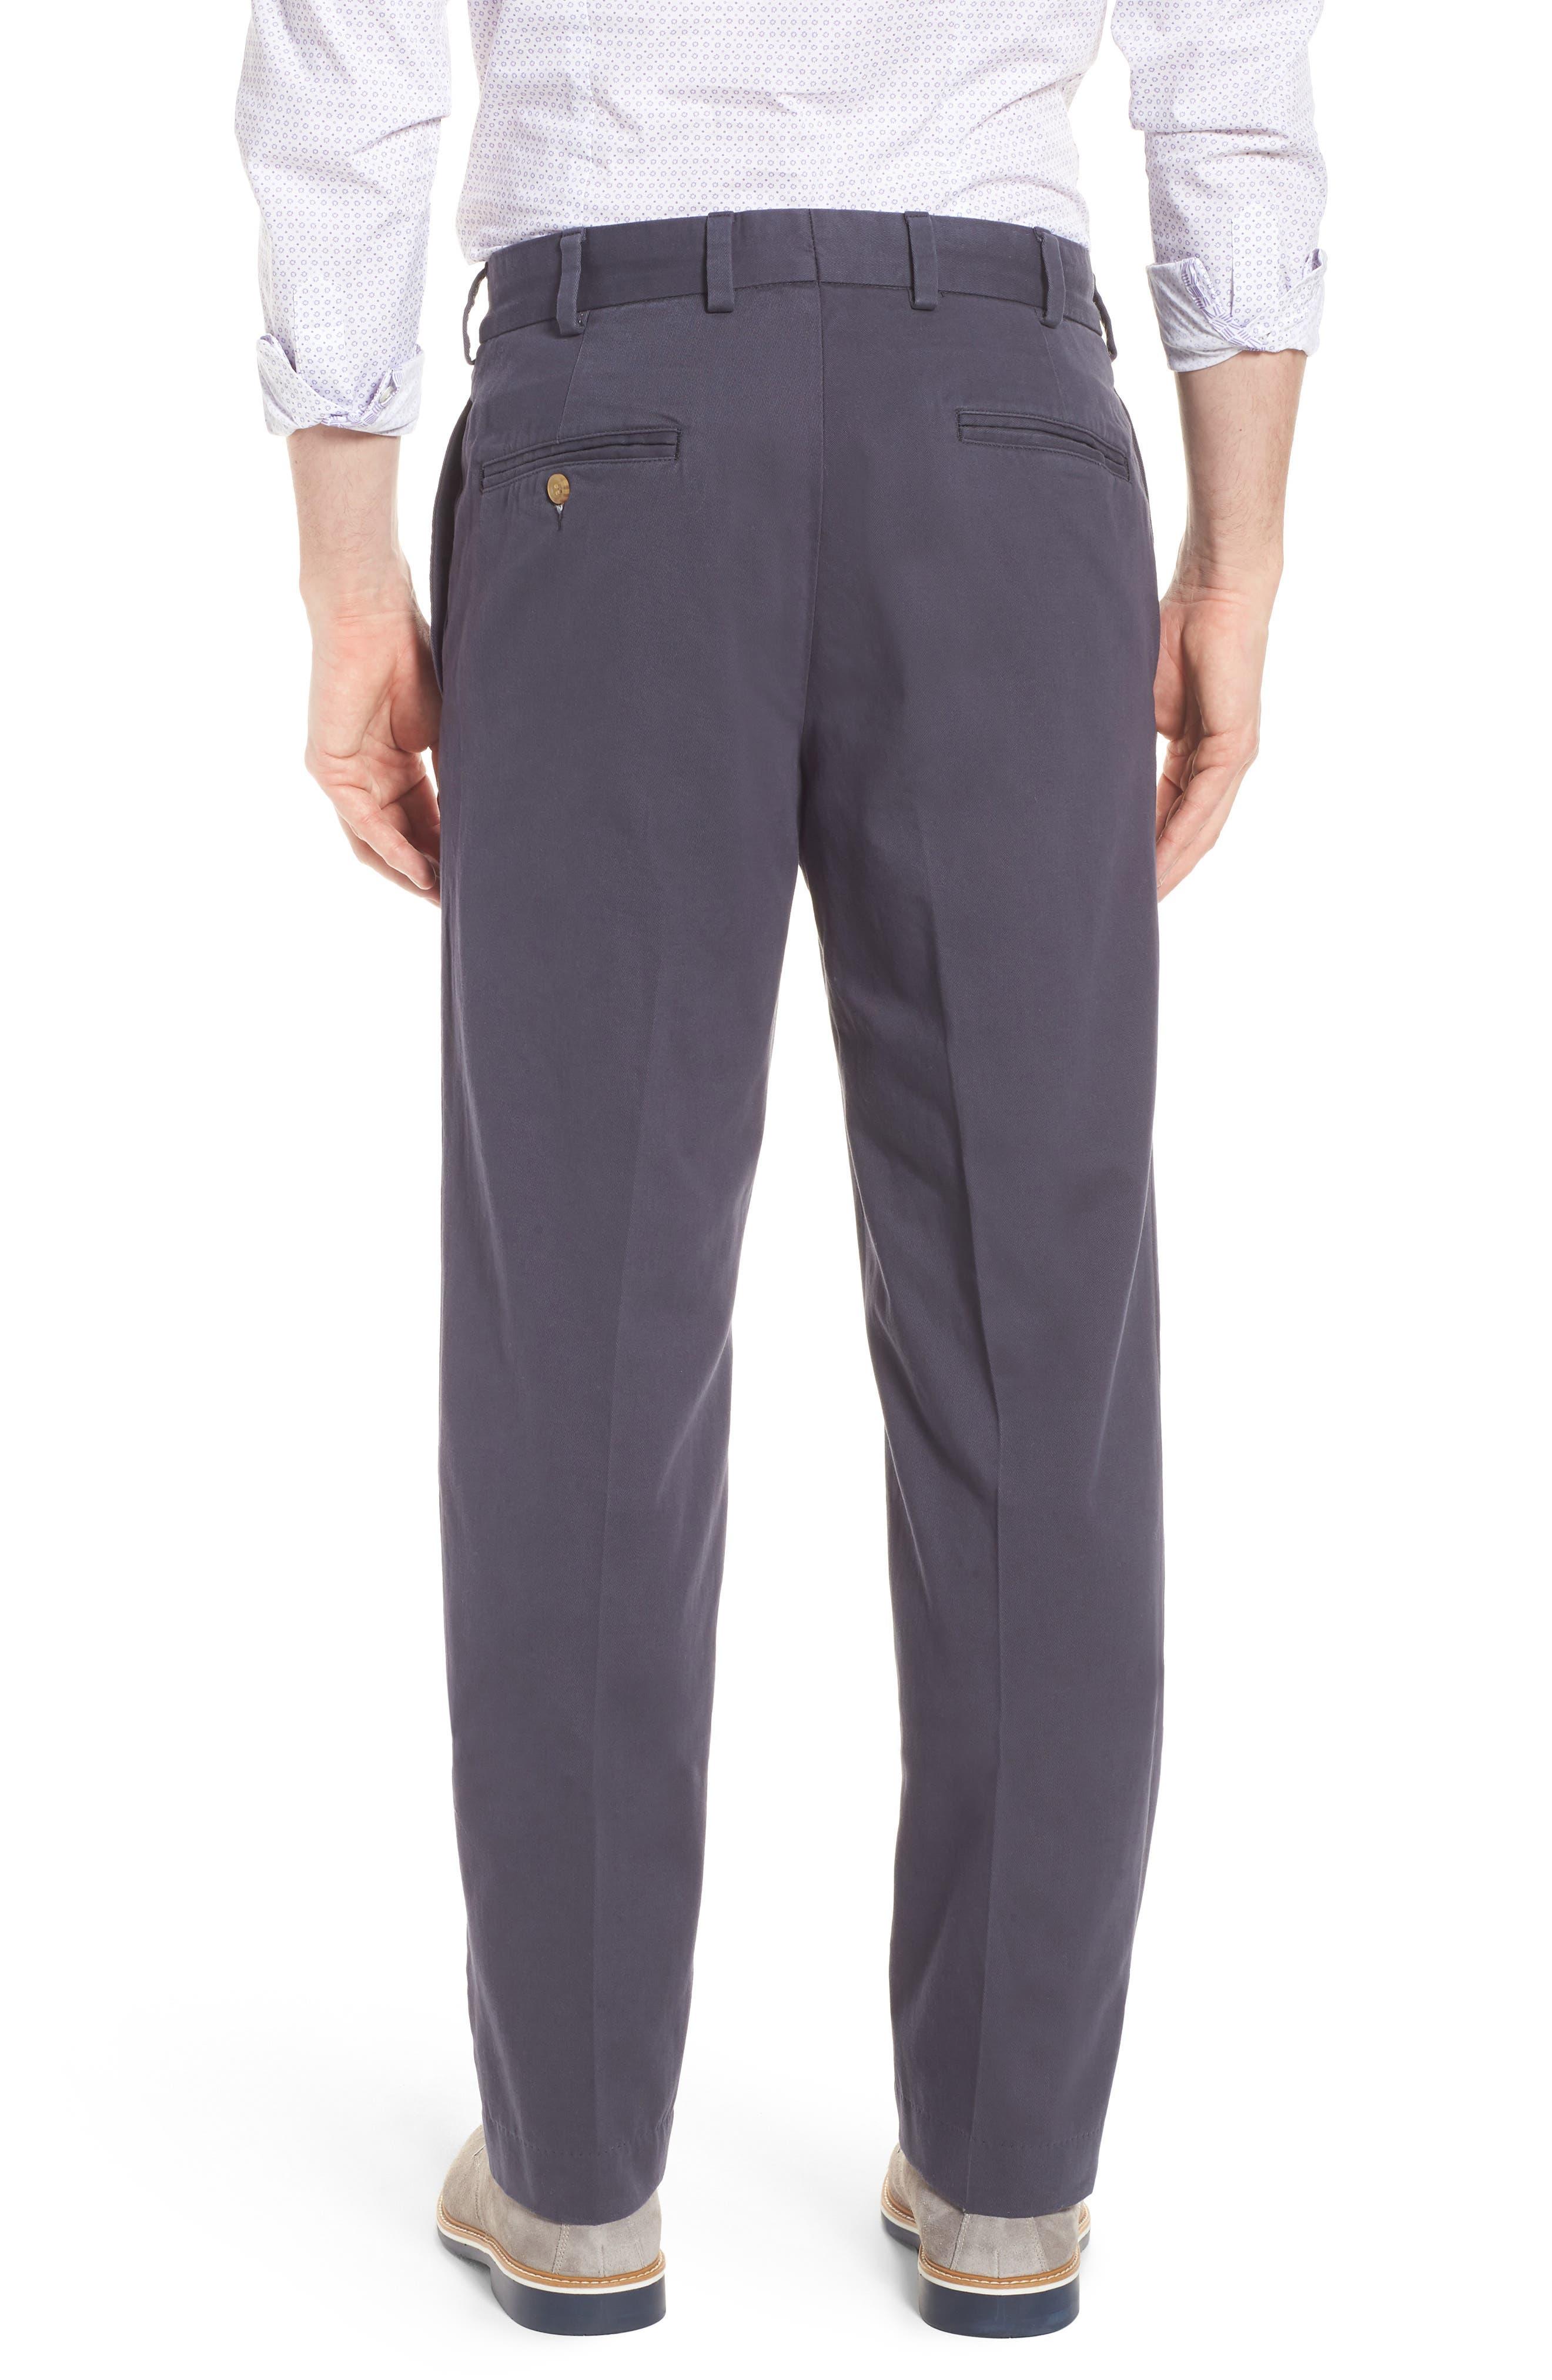 M2 Classic Fit Flat Front Vintage Twill Pants,                             Alternate thumbnail 2, color,                             410